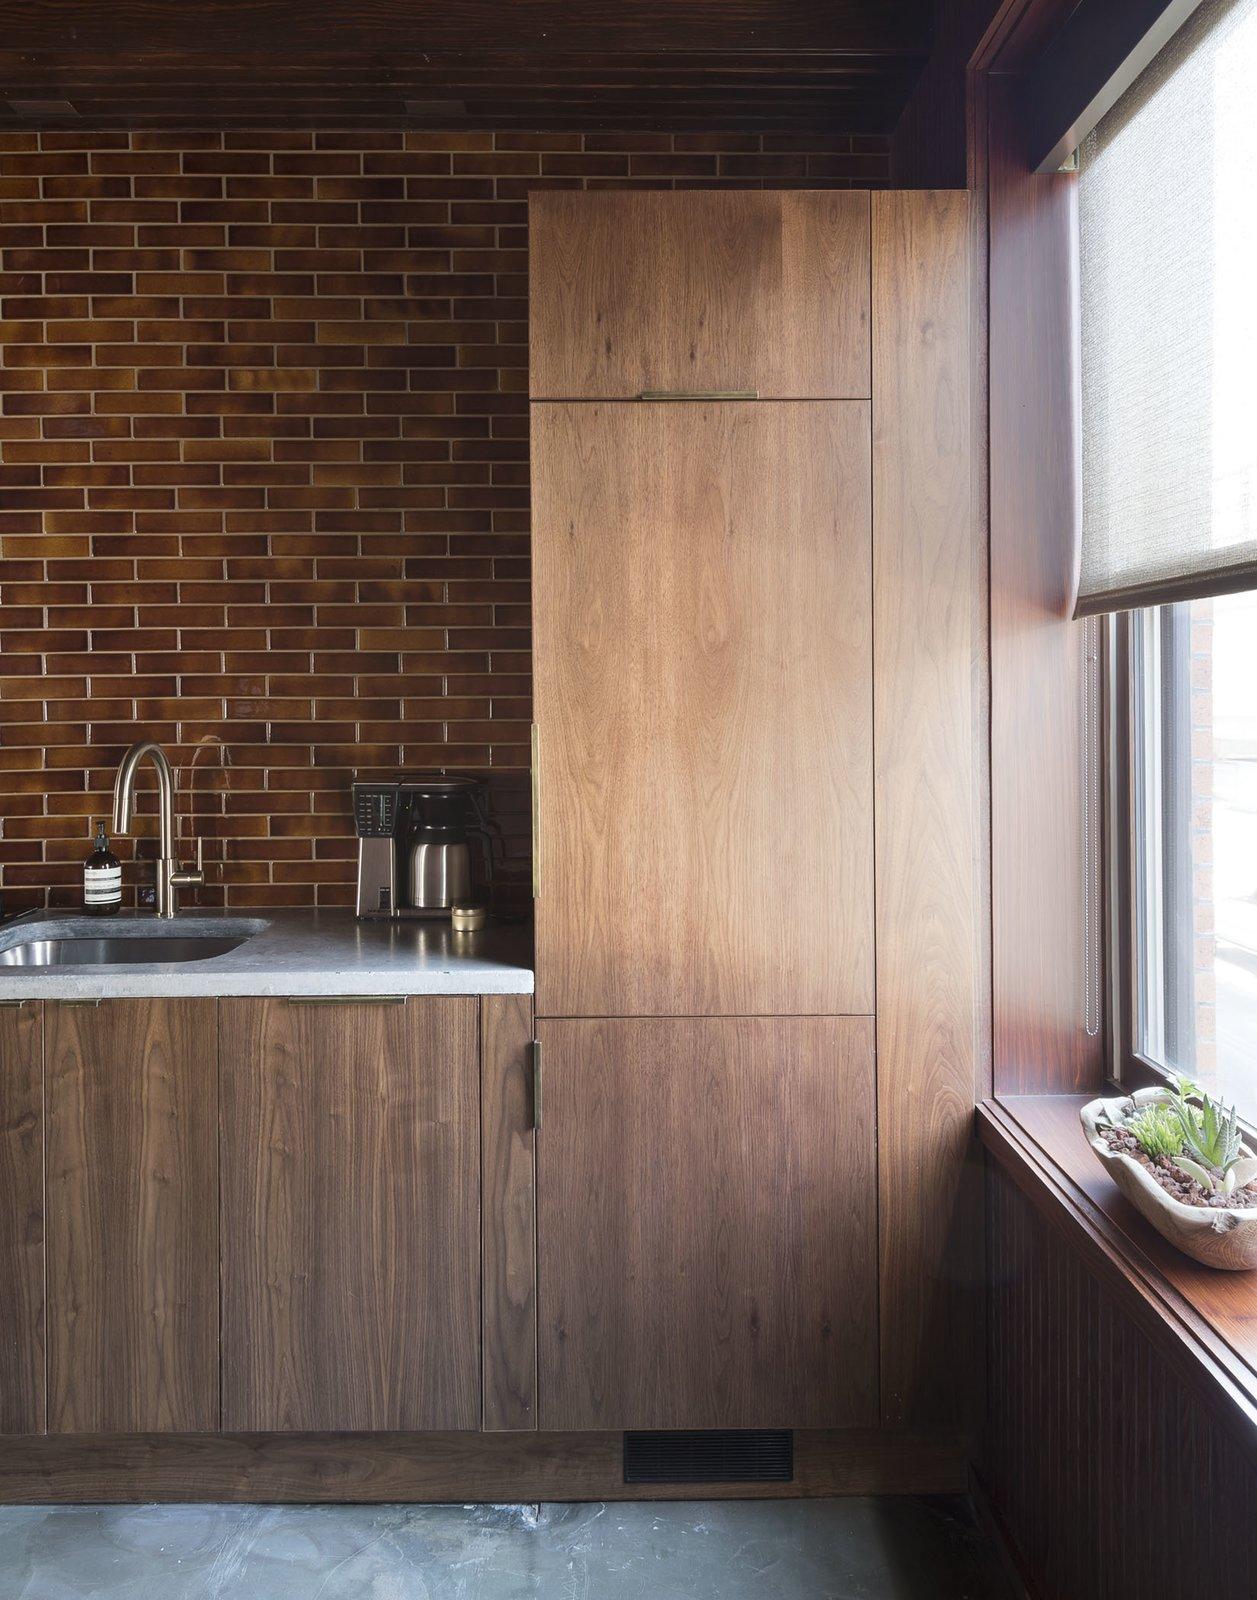 Kitchen, Wood Cabinet, Concrete Floor, Granite Counter, Ceramic Tile Backsplashe, Accent Lighting, Drop In Sink, and Refrigerator  Mulherin's Hotel